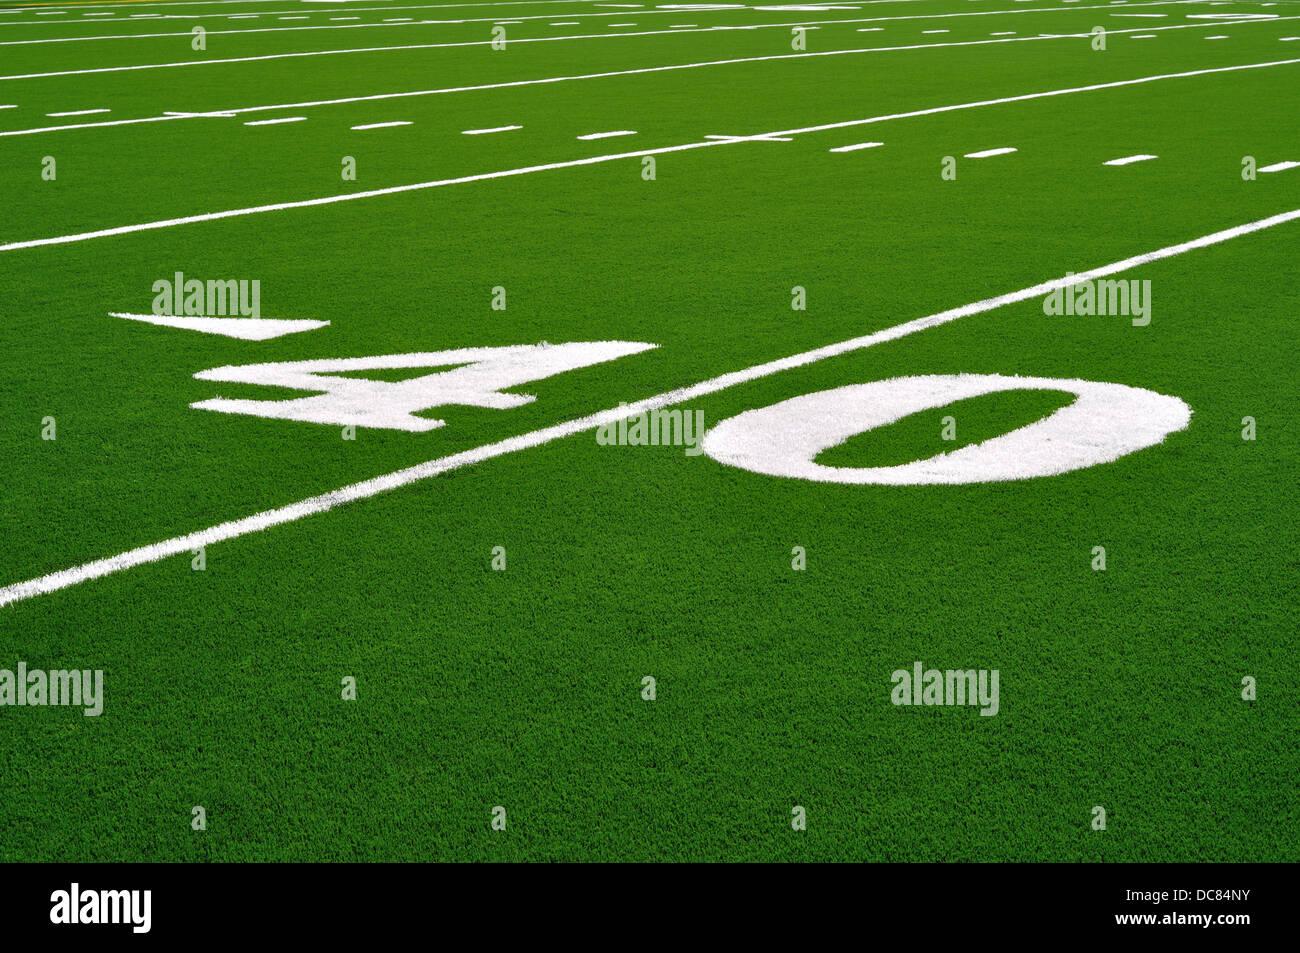 40 yard line on an American Football field - Stock Image